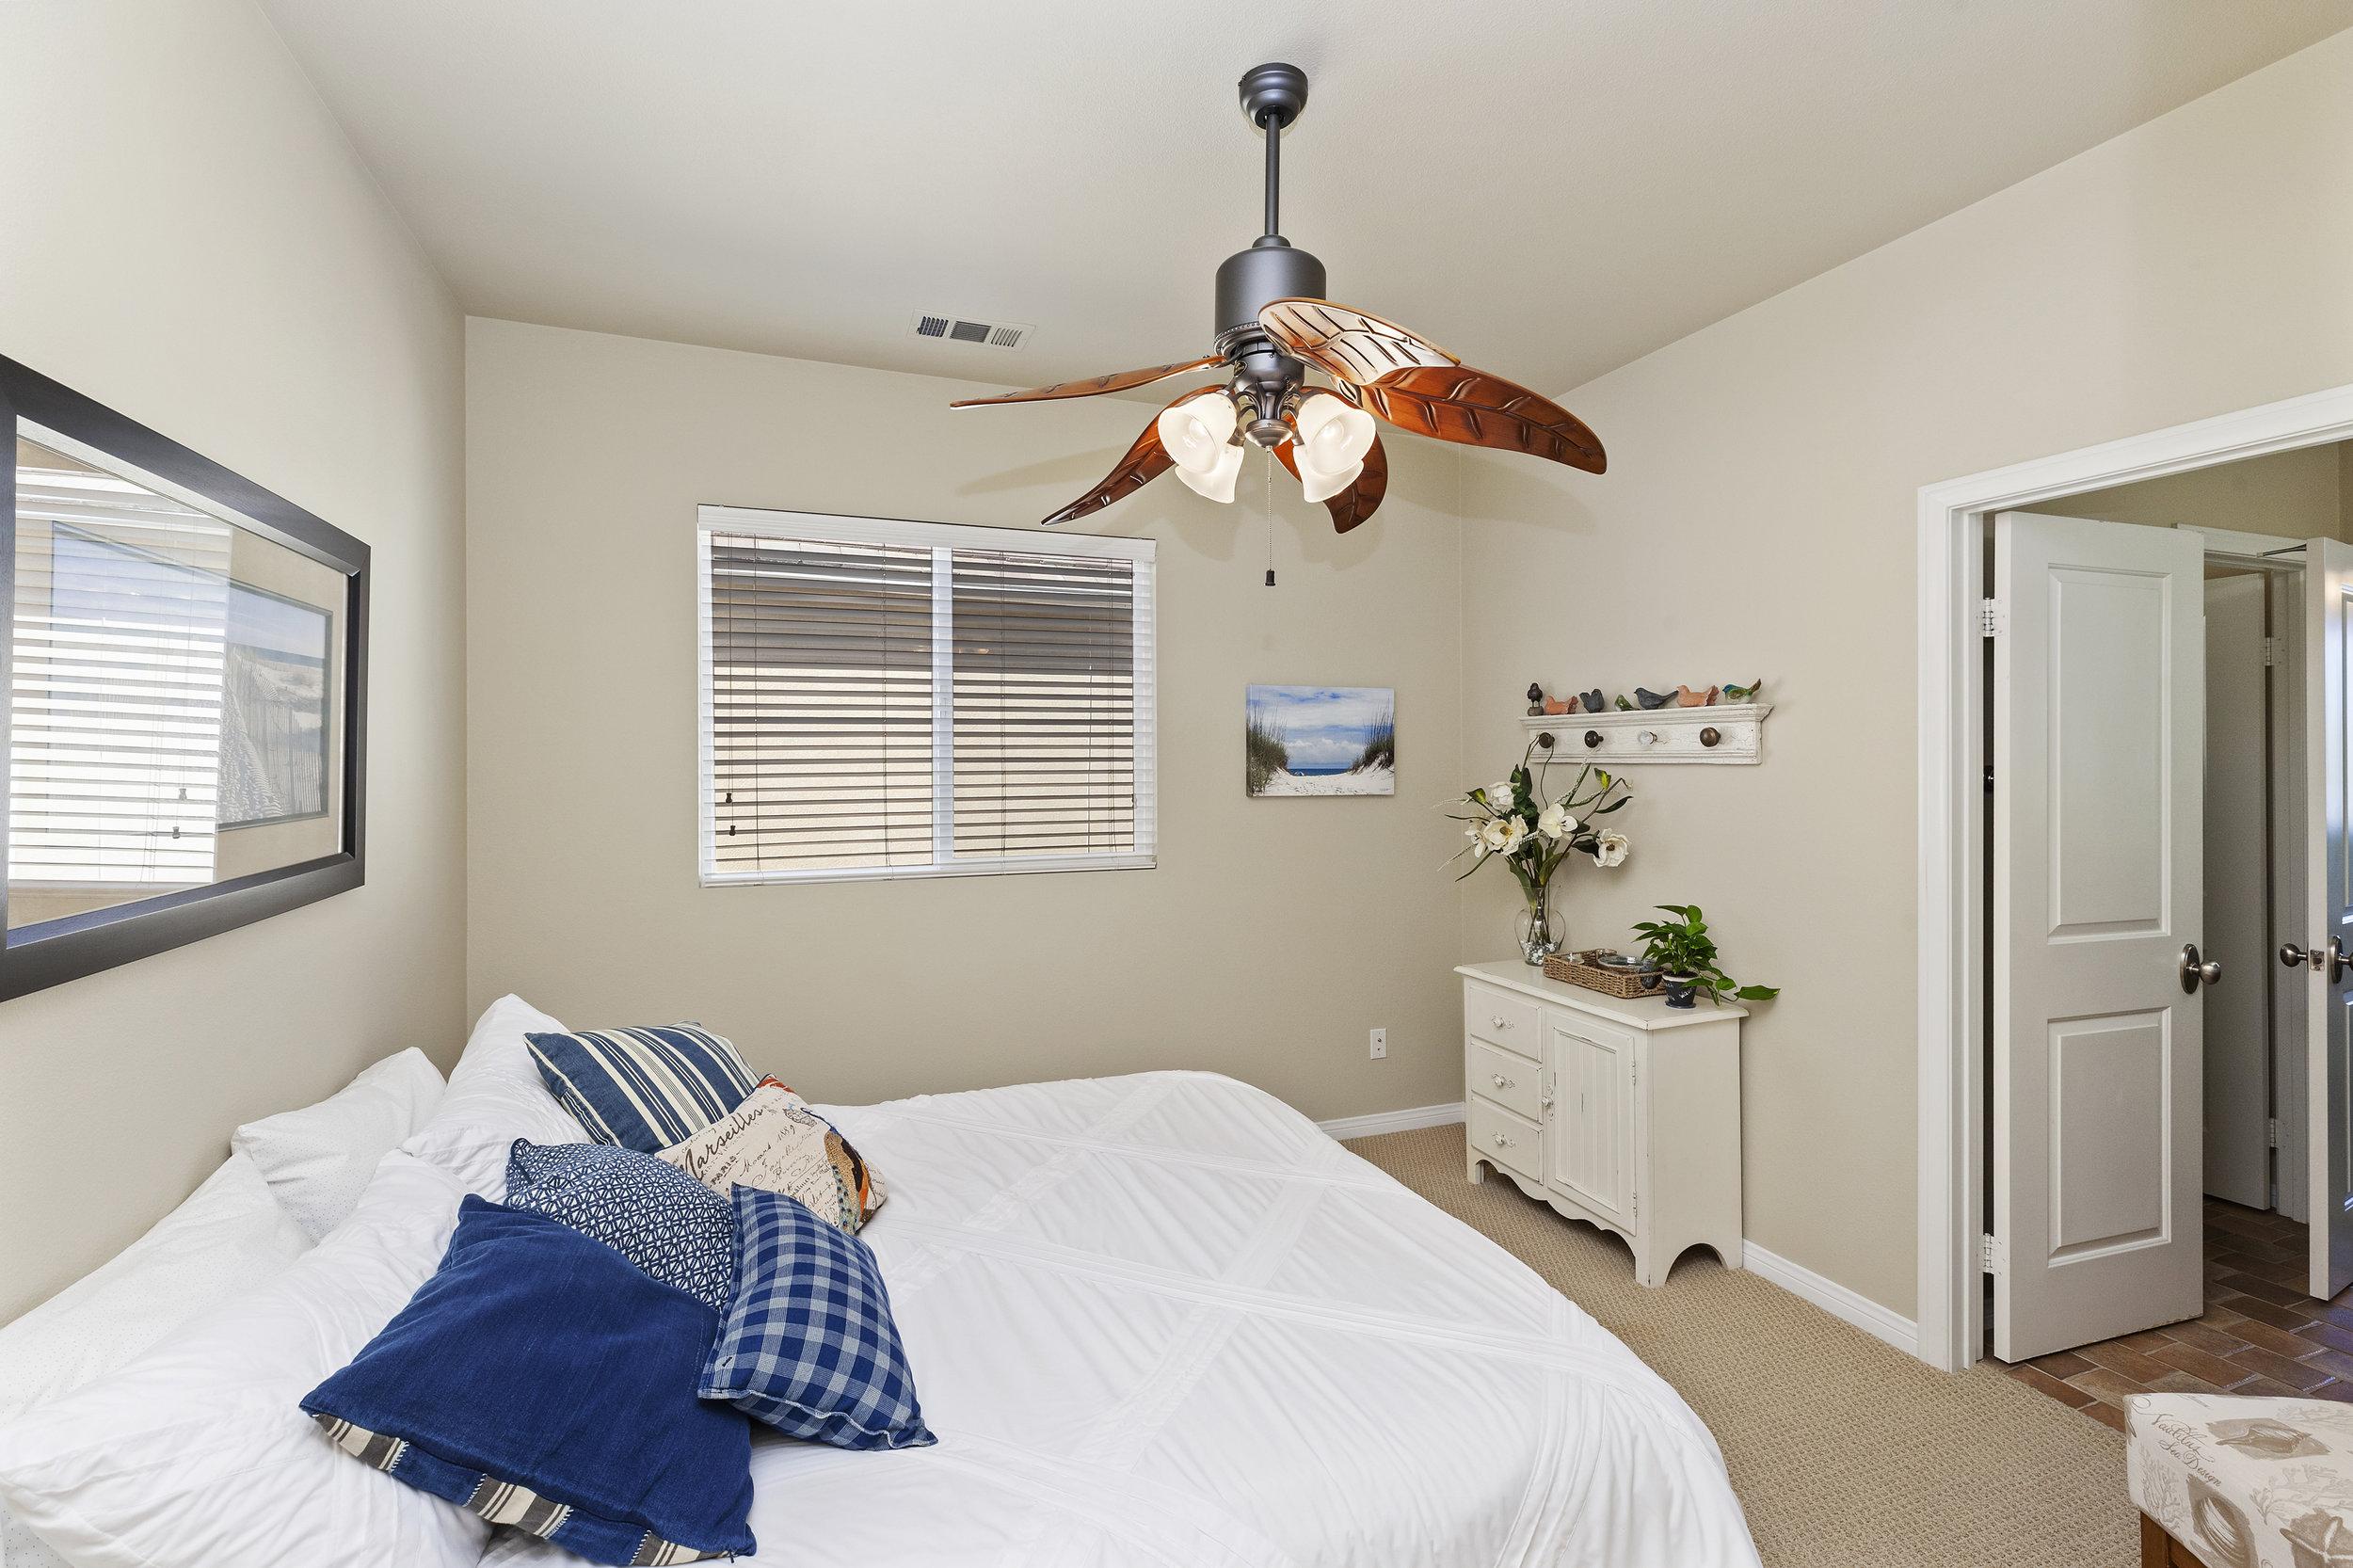 032_Bedroom 3.jpg